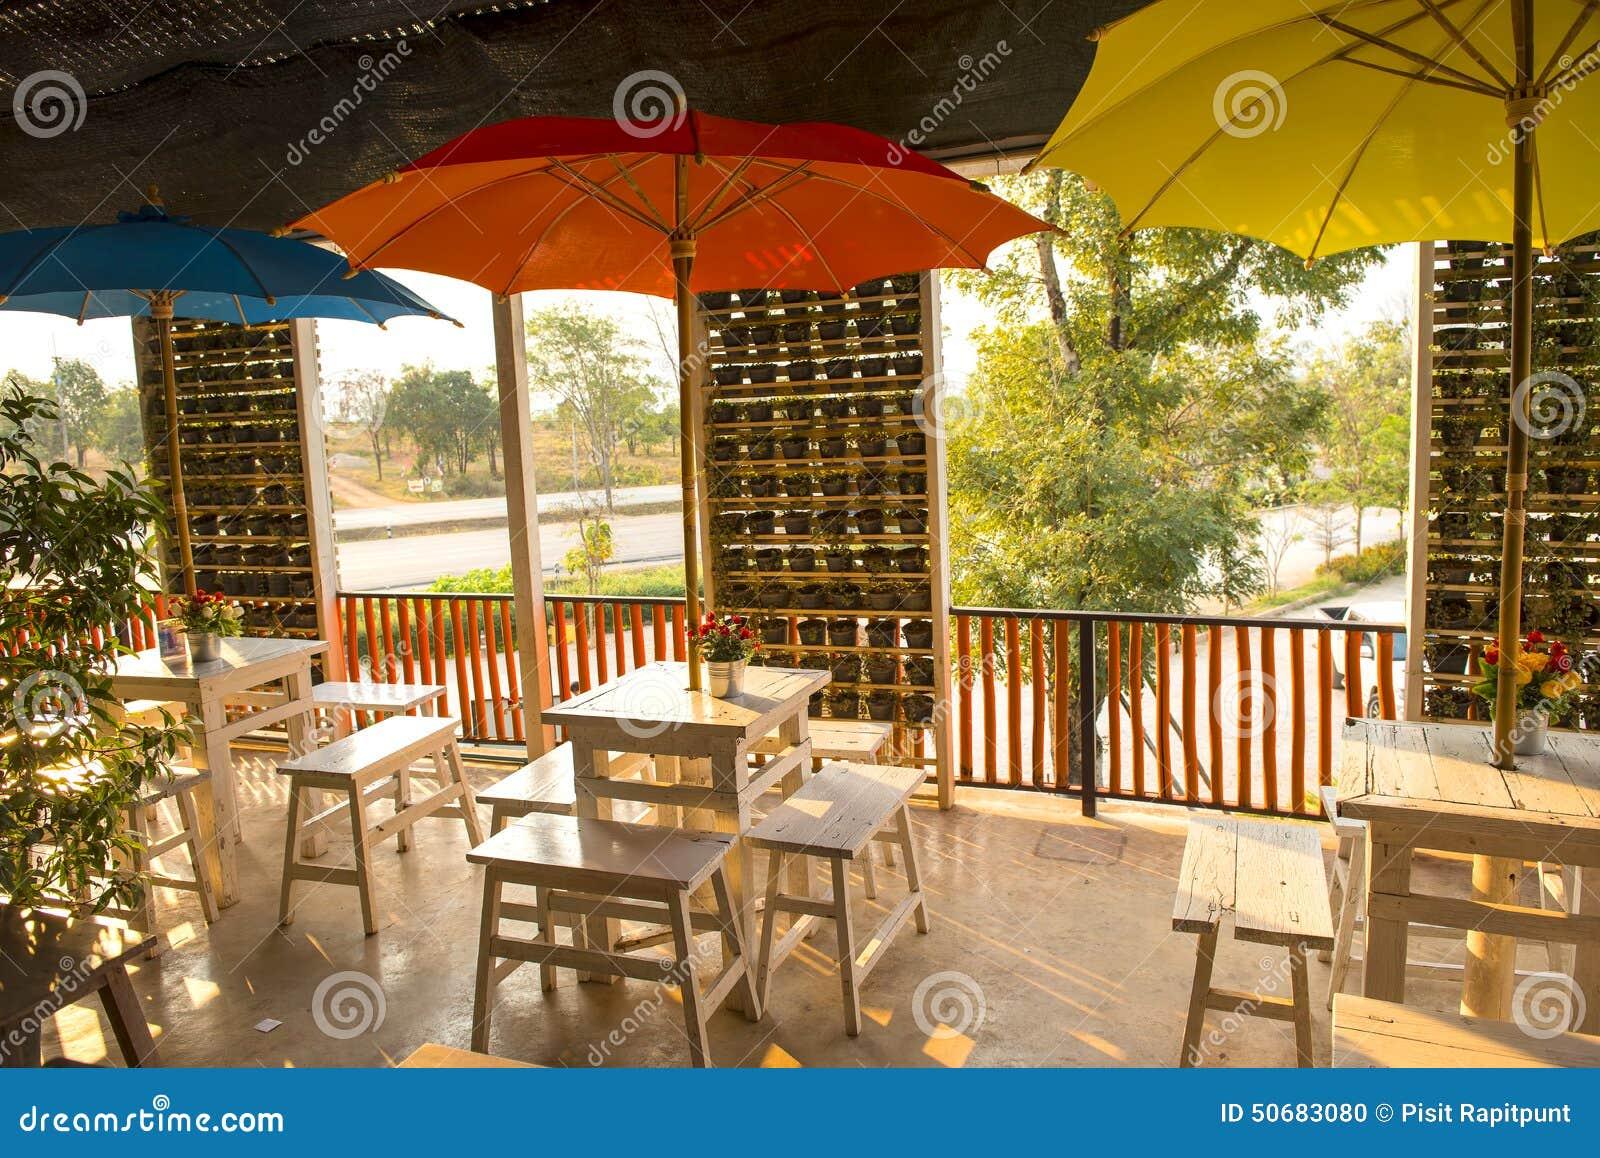 Download 在桌上的装饰花在咖啡店,泰国 库存照片. 图片 包括有 内部, 五颜六色, 阿诺德, 瓶子, 叶子, 花卉 - 50683080